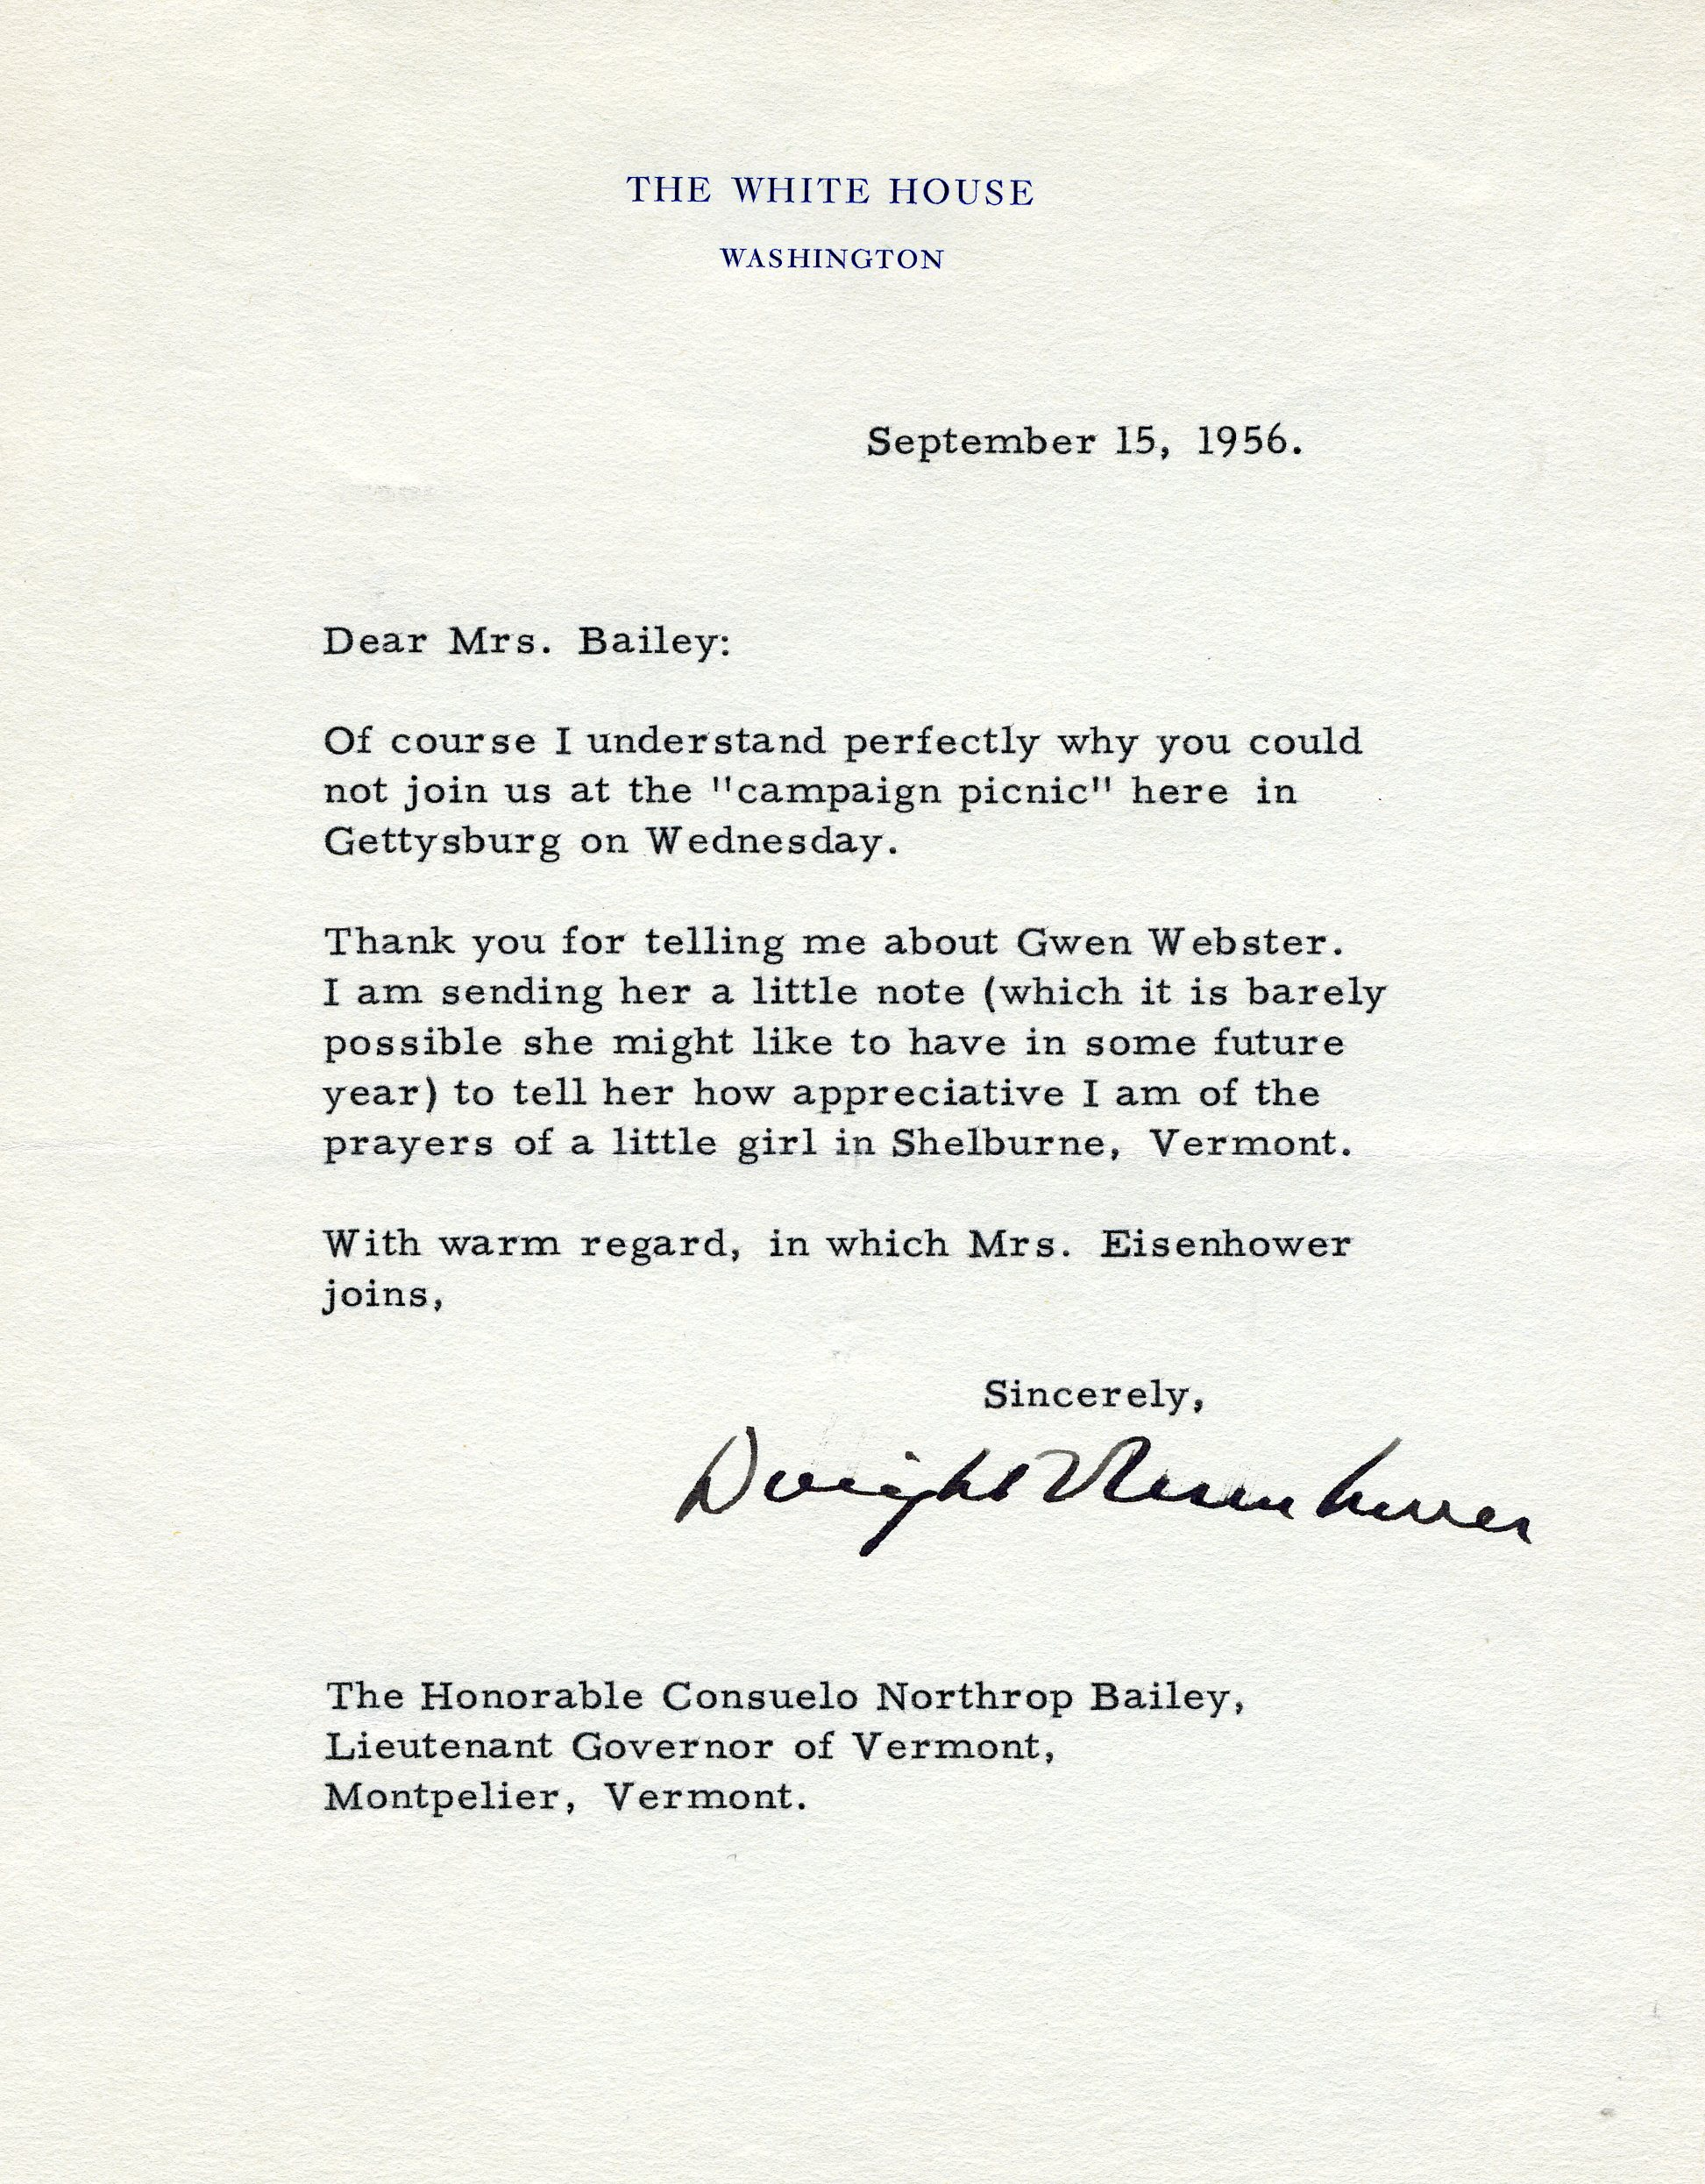 President Dwight D. Eisenhower to Consuelo Northrop Bailey, 1956, September 15